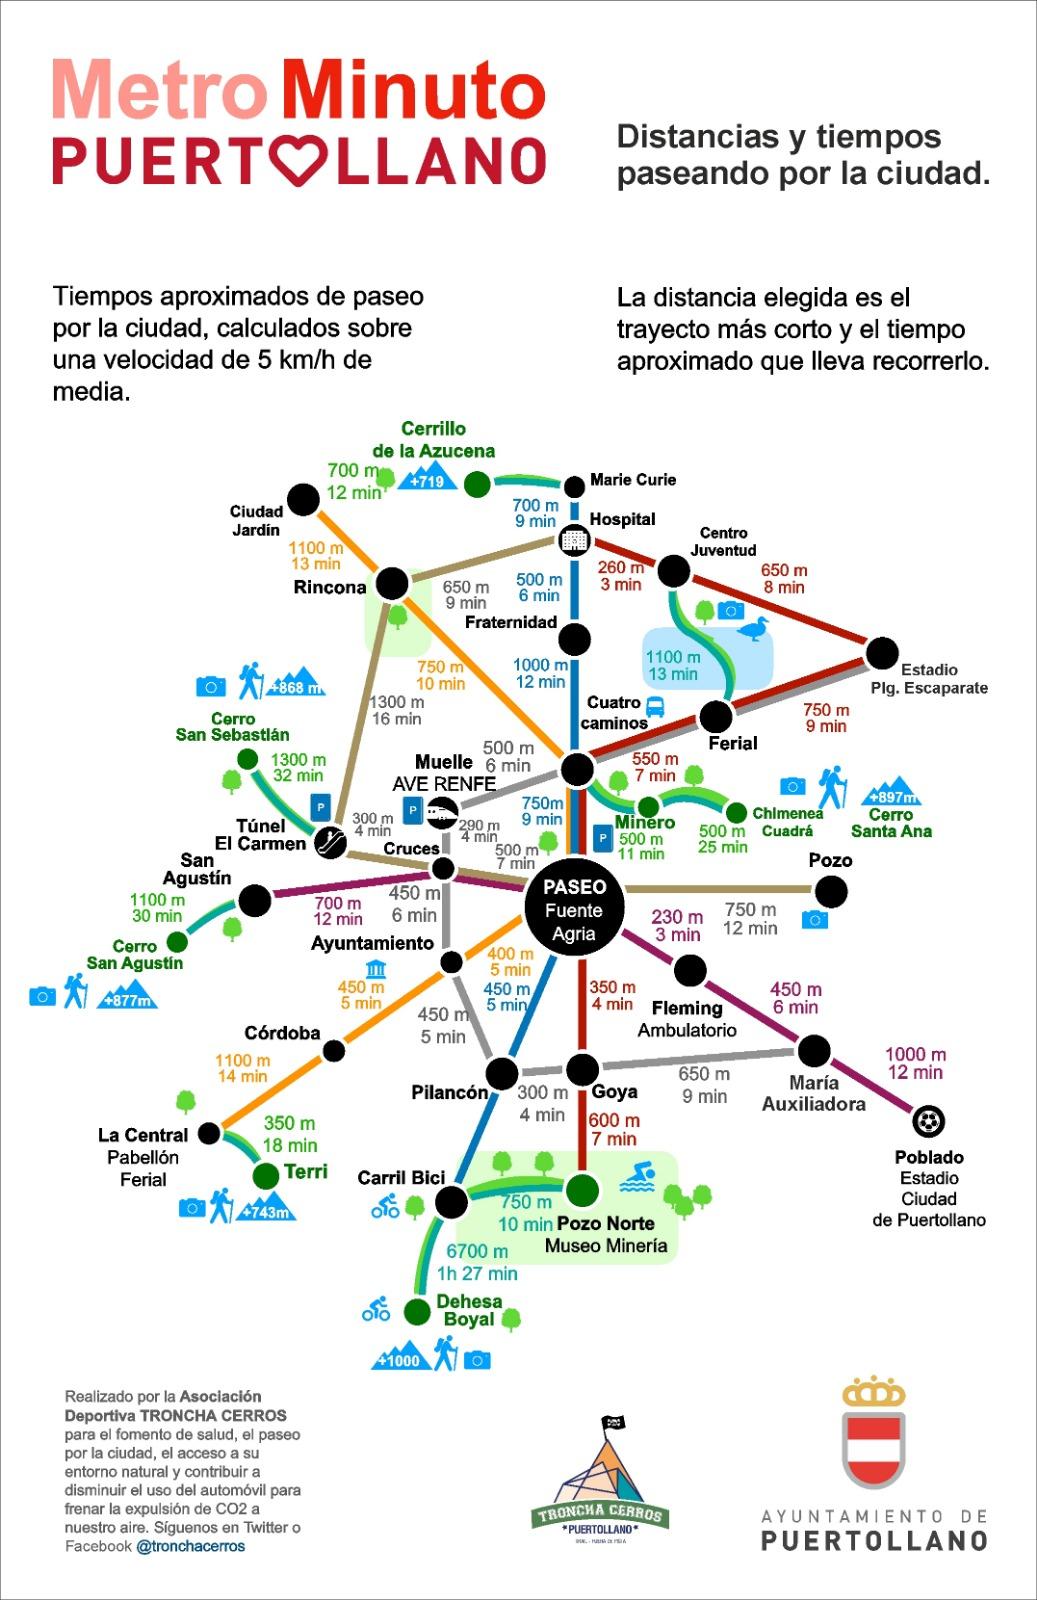 MetroMinuto Puertollano - Troncha Cerros